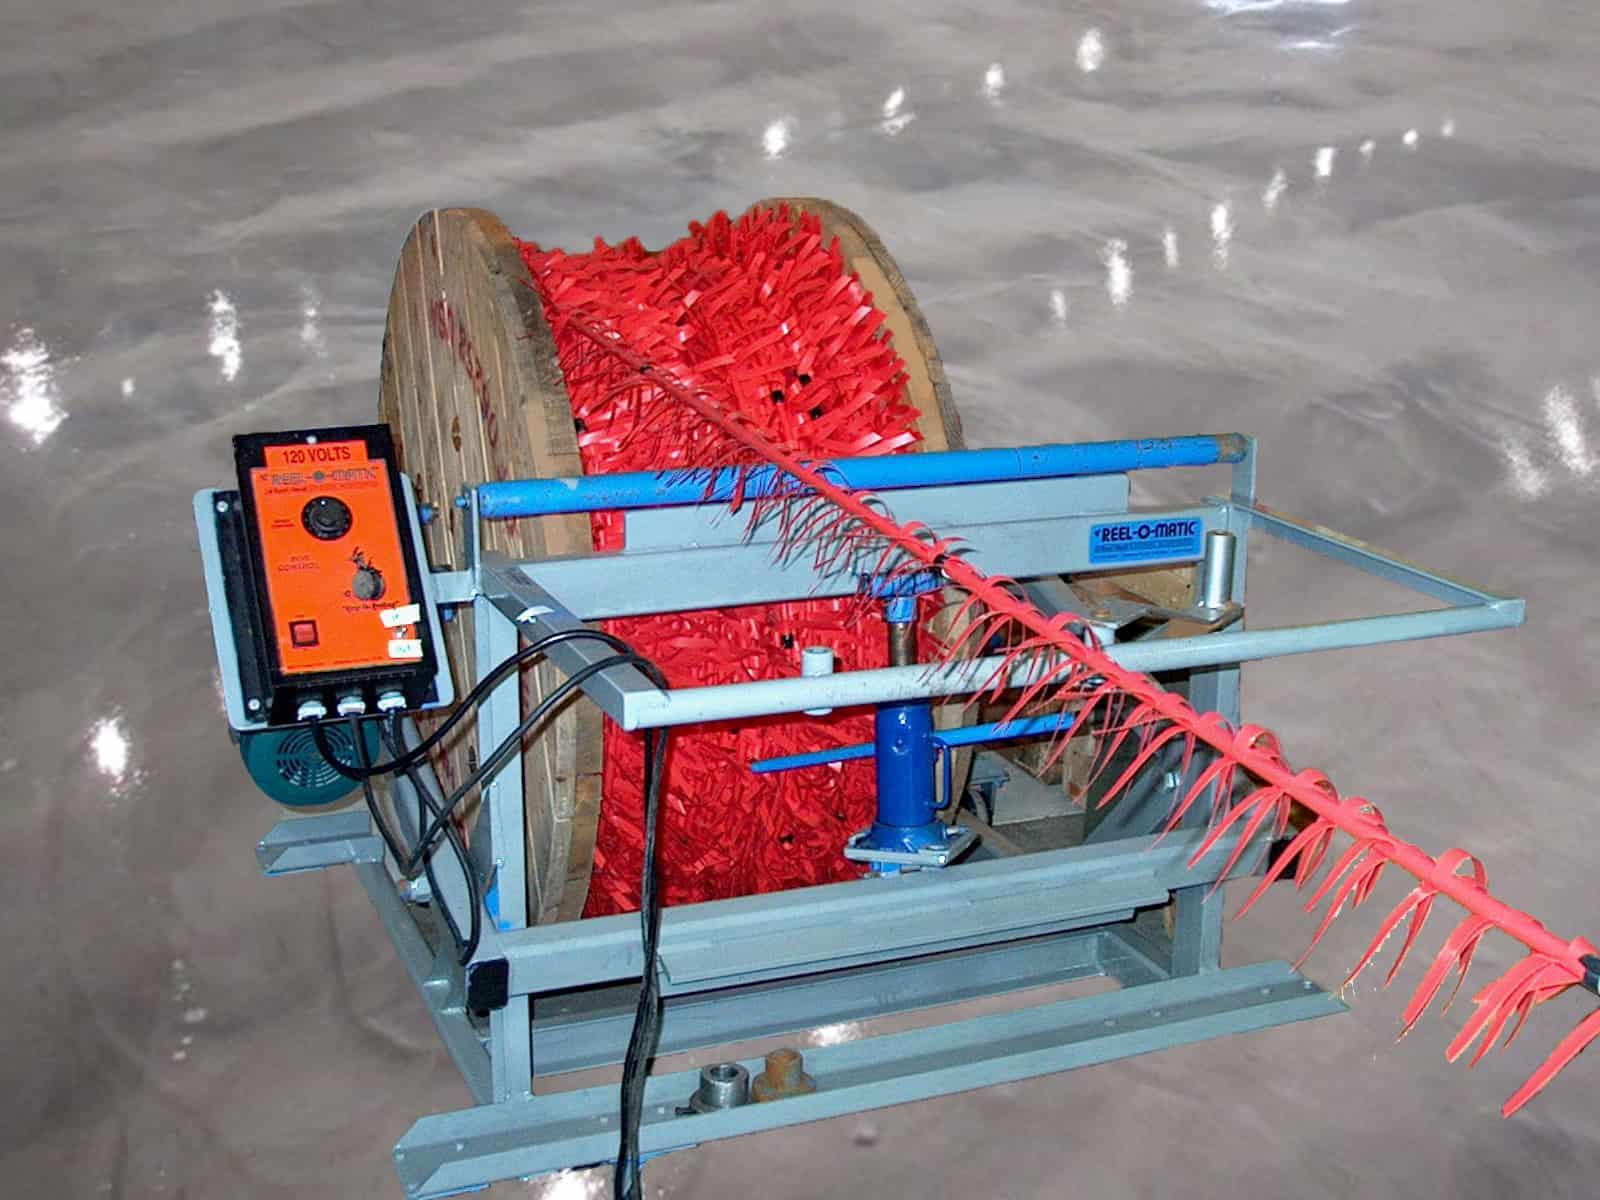 Fairwrap Cable Fairing